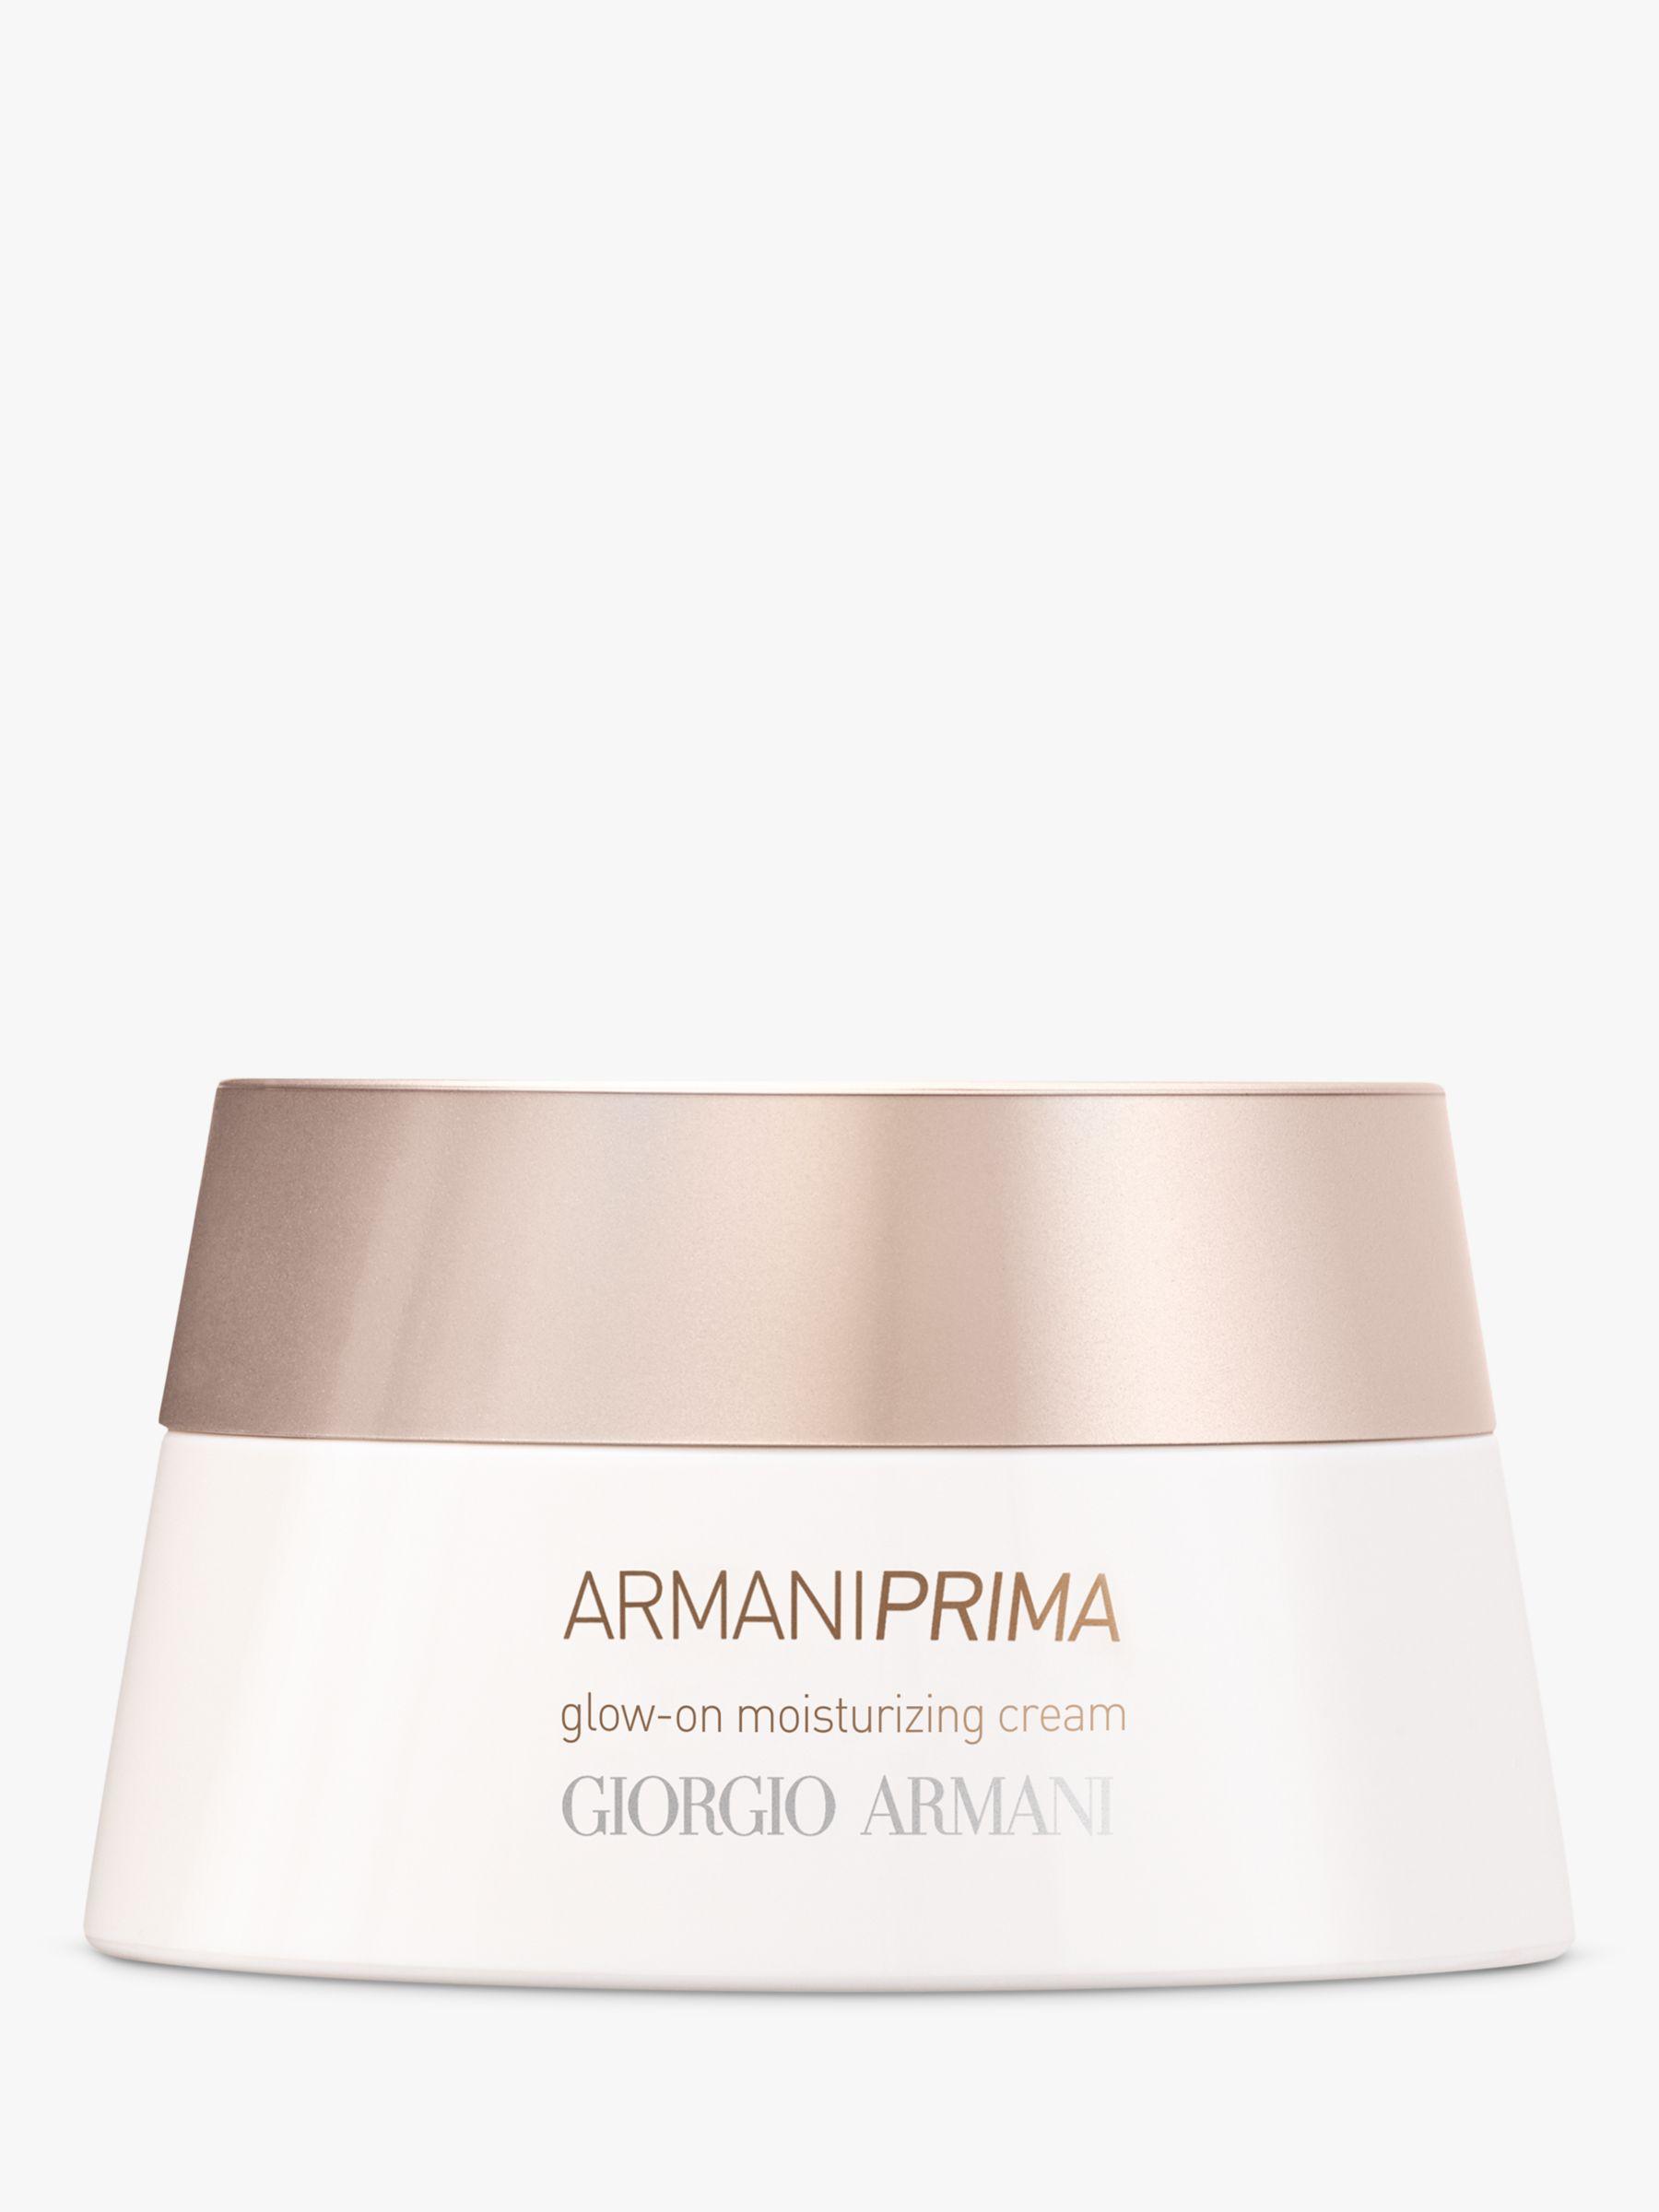 Giorgio Armani Giorgio Armani Prima Glow-On Moisturising Cream, 50g